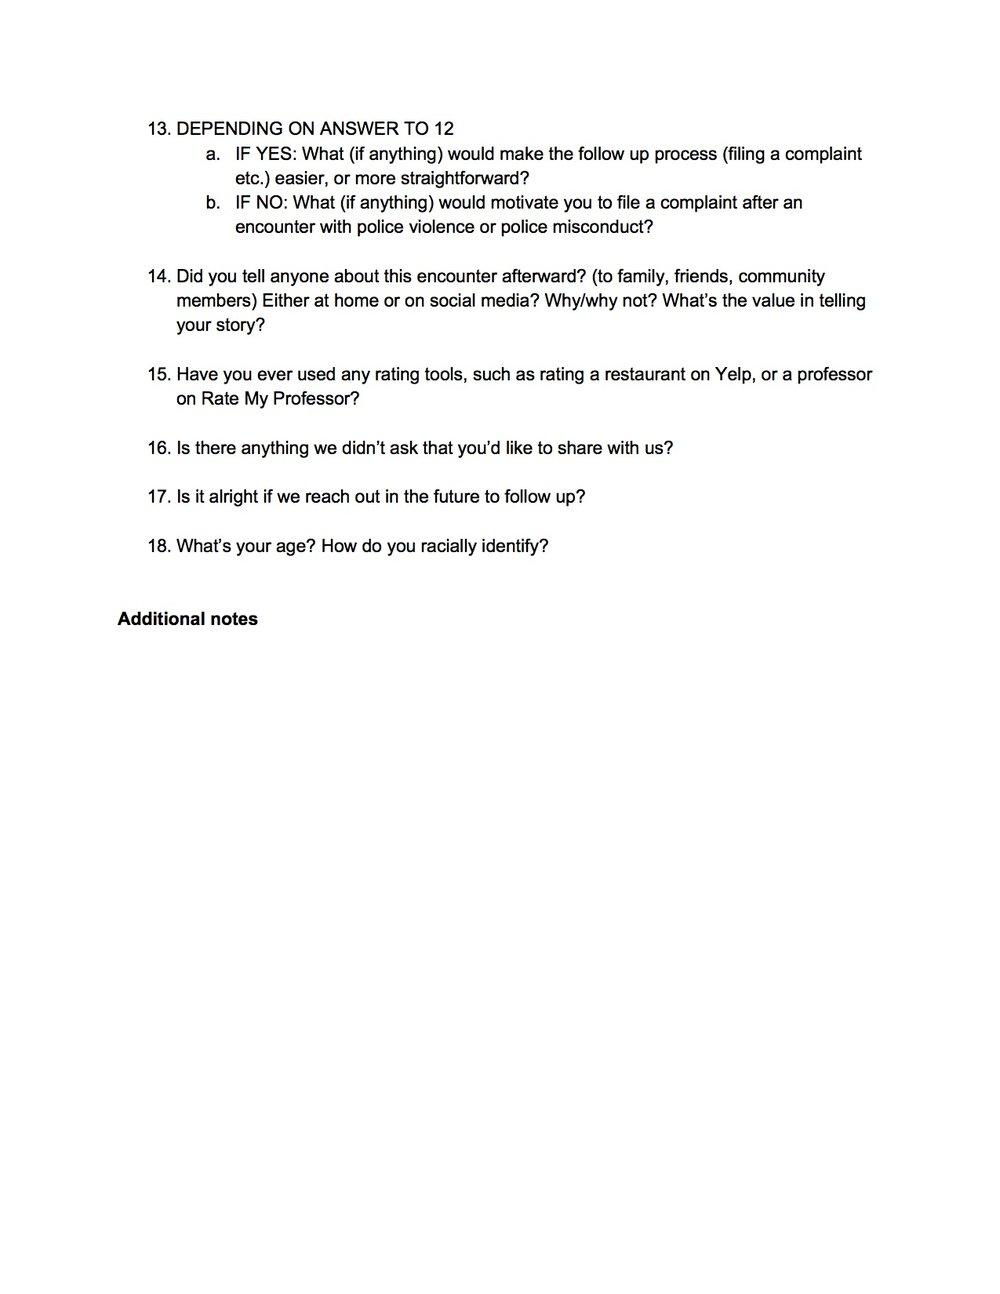 interview guidelines pg 2.jpg